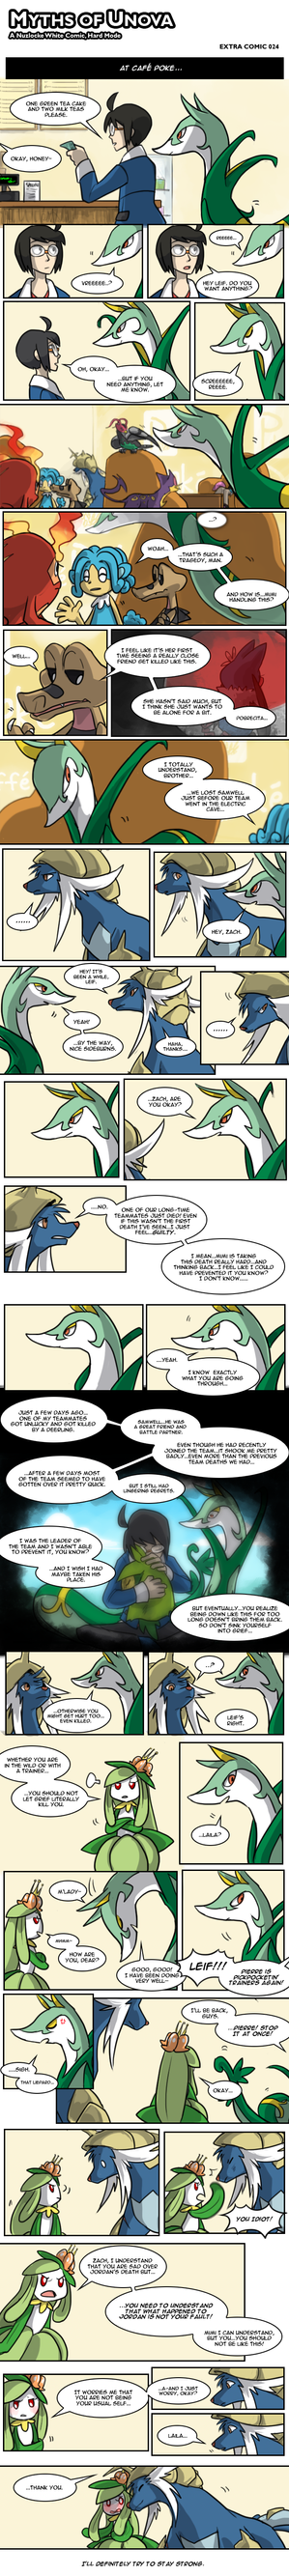 Nuzlocke White: Extra Comic 24 by ky-nim